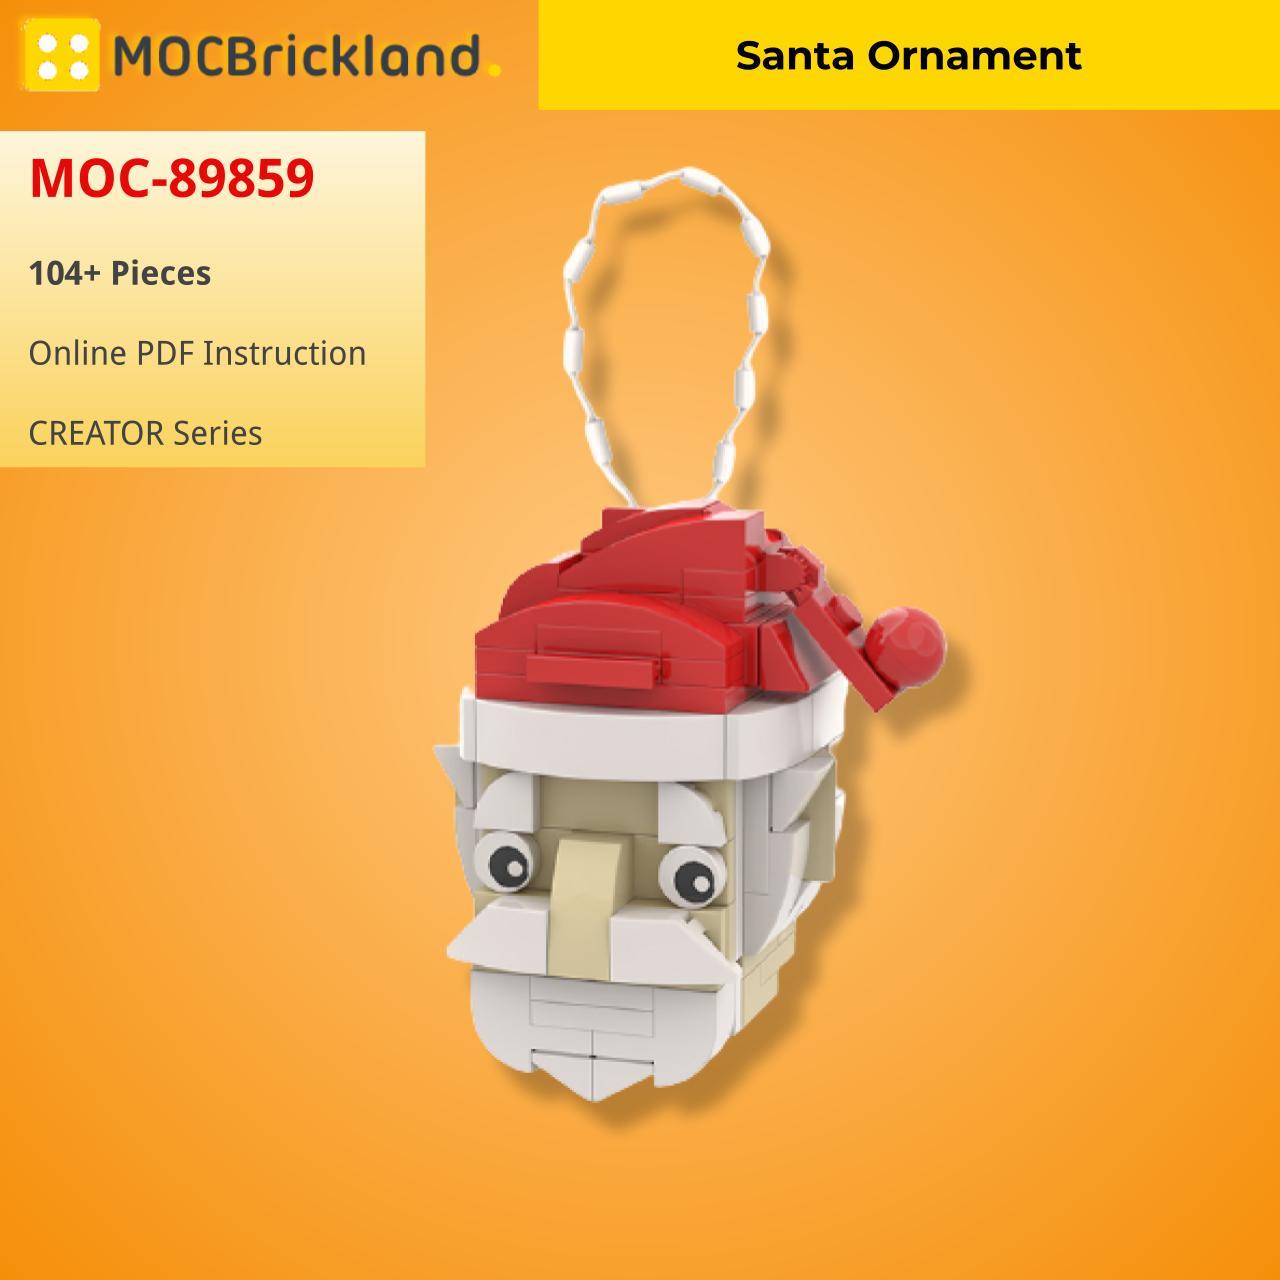 Santa Ornament CREATOR MOC-89859 WITH 104 PIECES